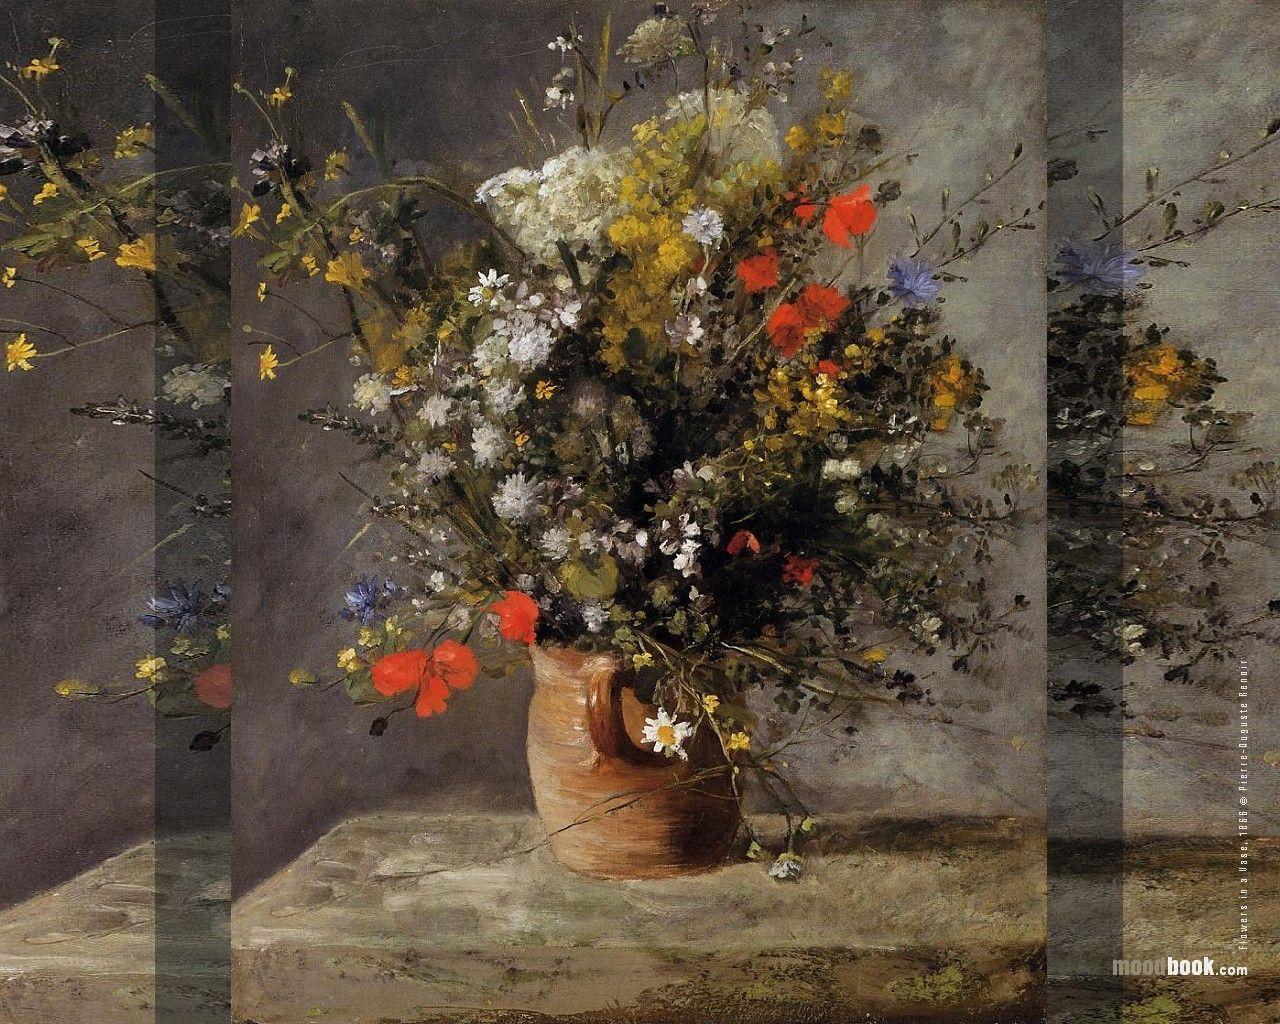 1280x1024 Hoa: Art Renoir Still Vase Auguste Pierre Pot Wild Beautiful